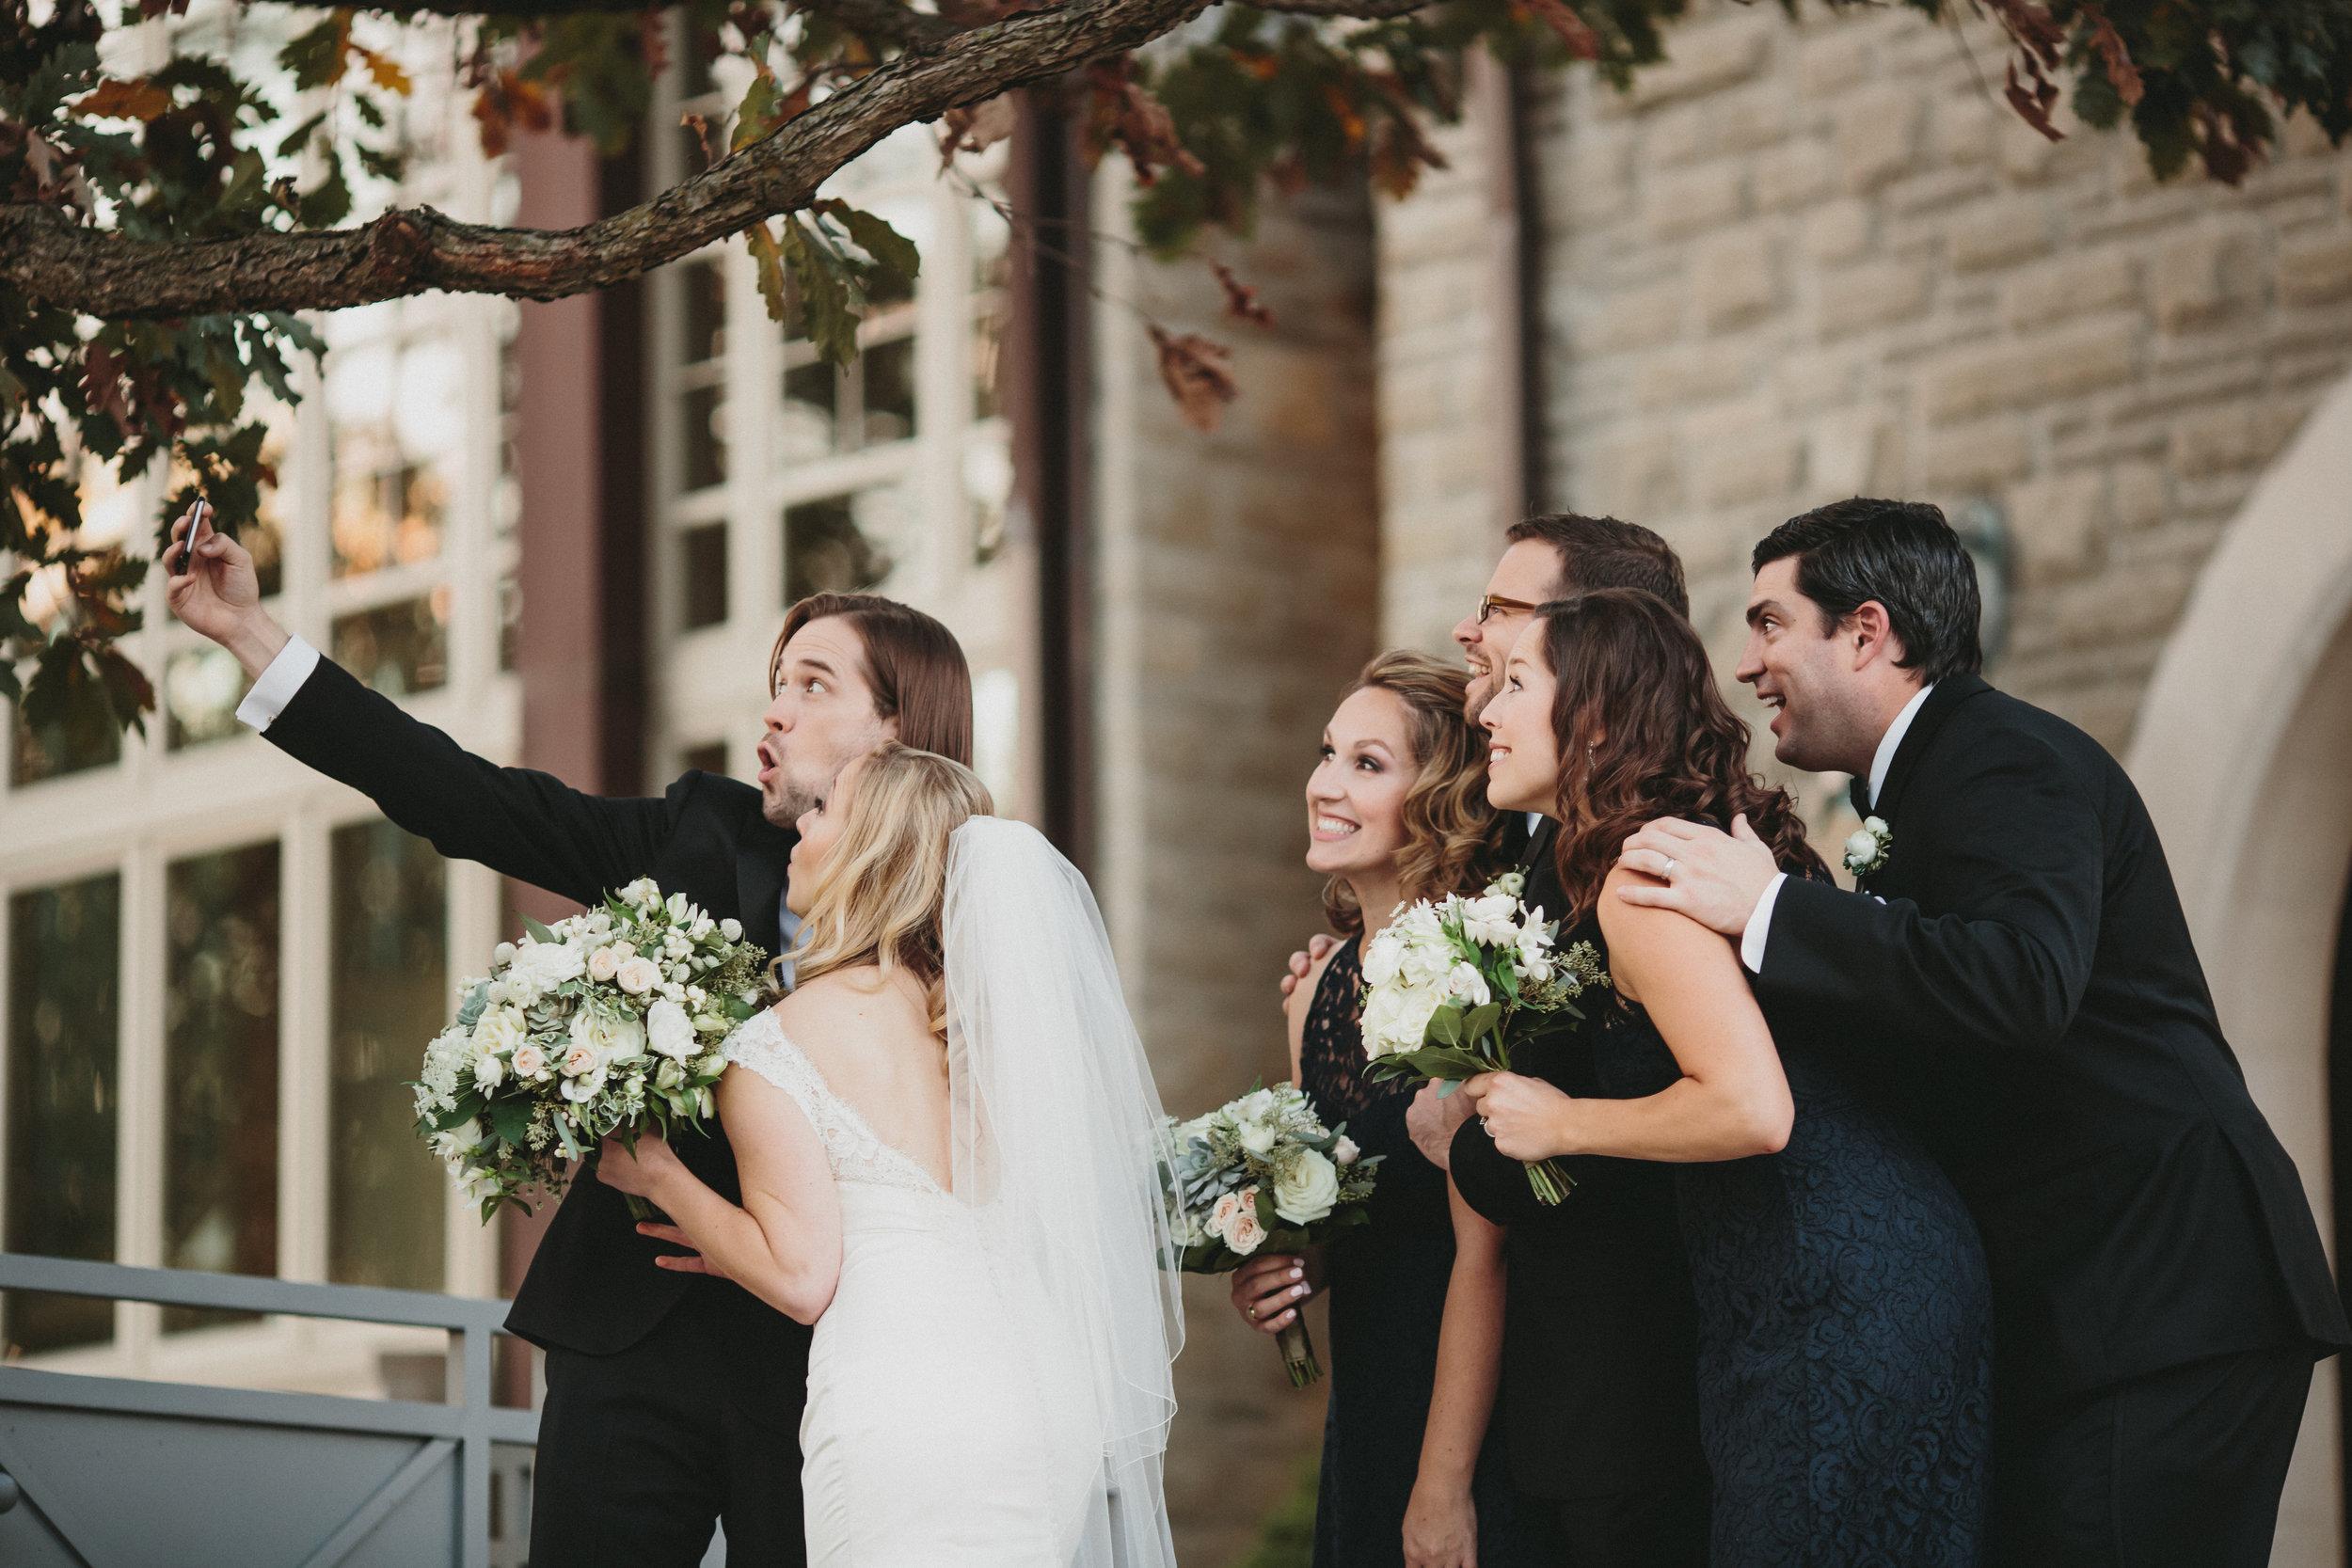 the_carrs_photography_katie_matt_wedding_0650.jpg